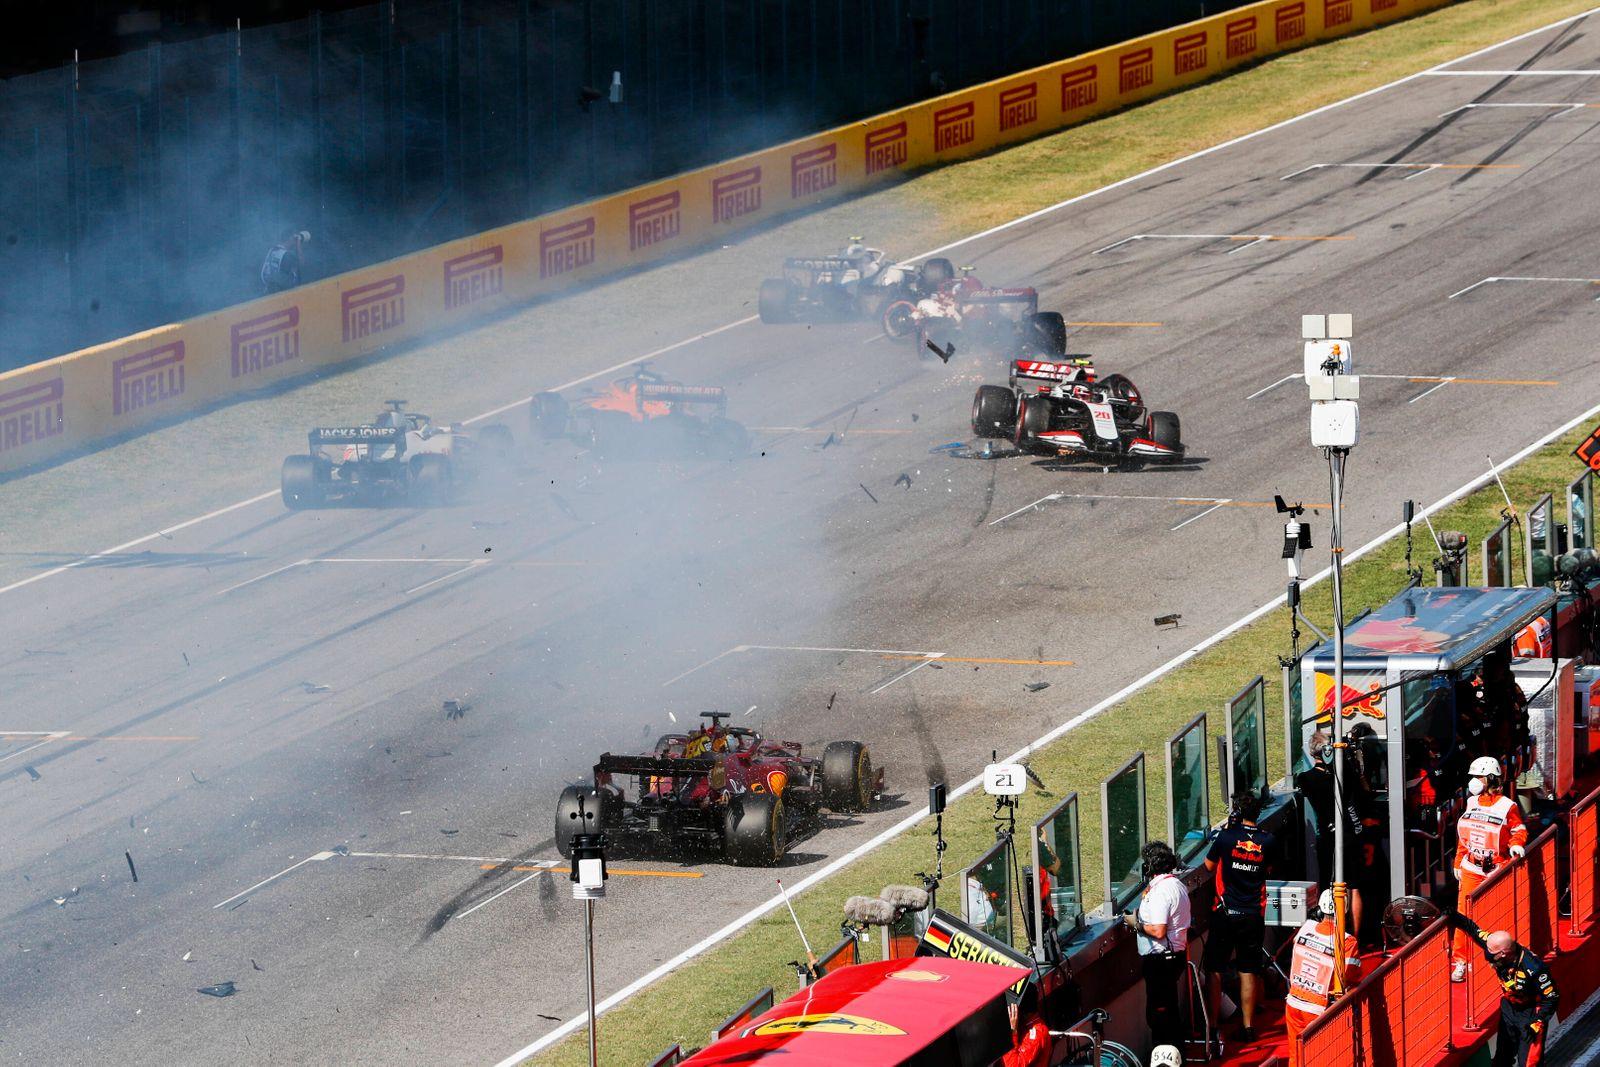 2020 Tuscany GP MUGELLO CIRCUIT, ITALY - SEPTEMBER 13: Kevin Magnussen, Haas VF-20 and Carlos Sainz, McLaren MCL35 cras